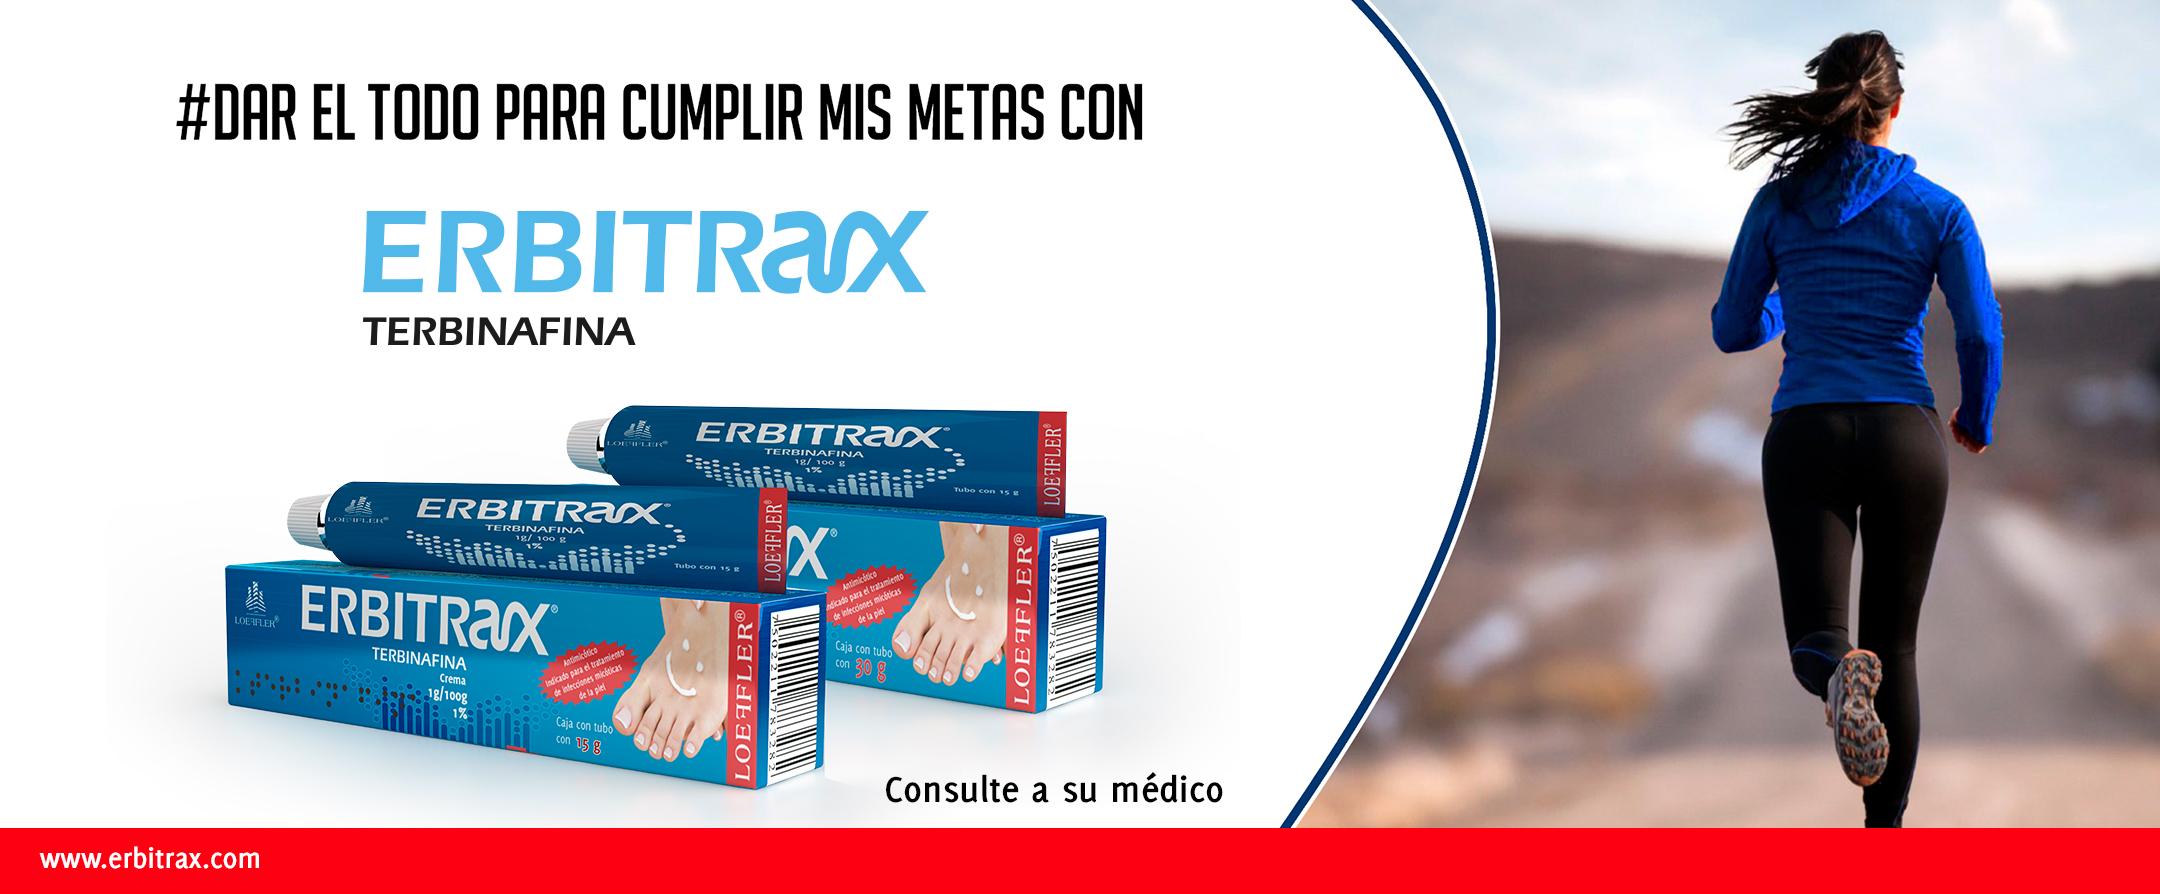 ERBITRAX4